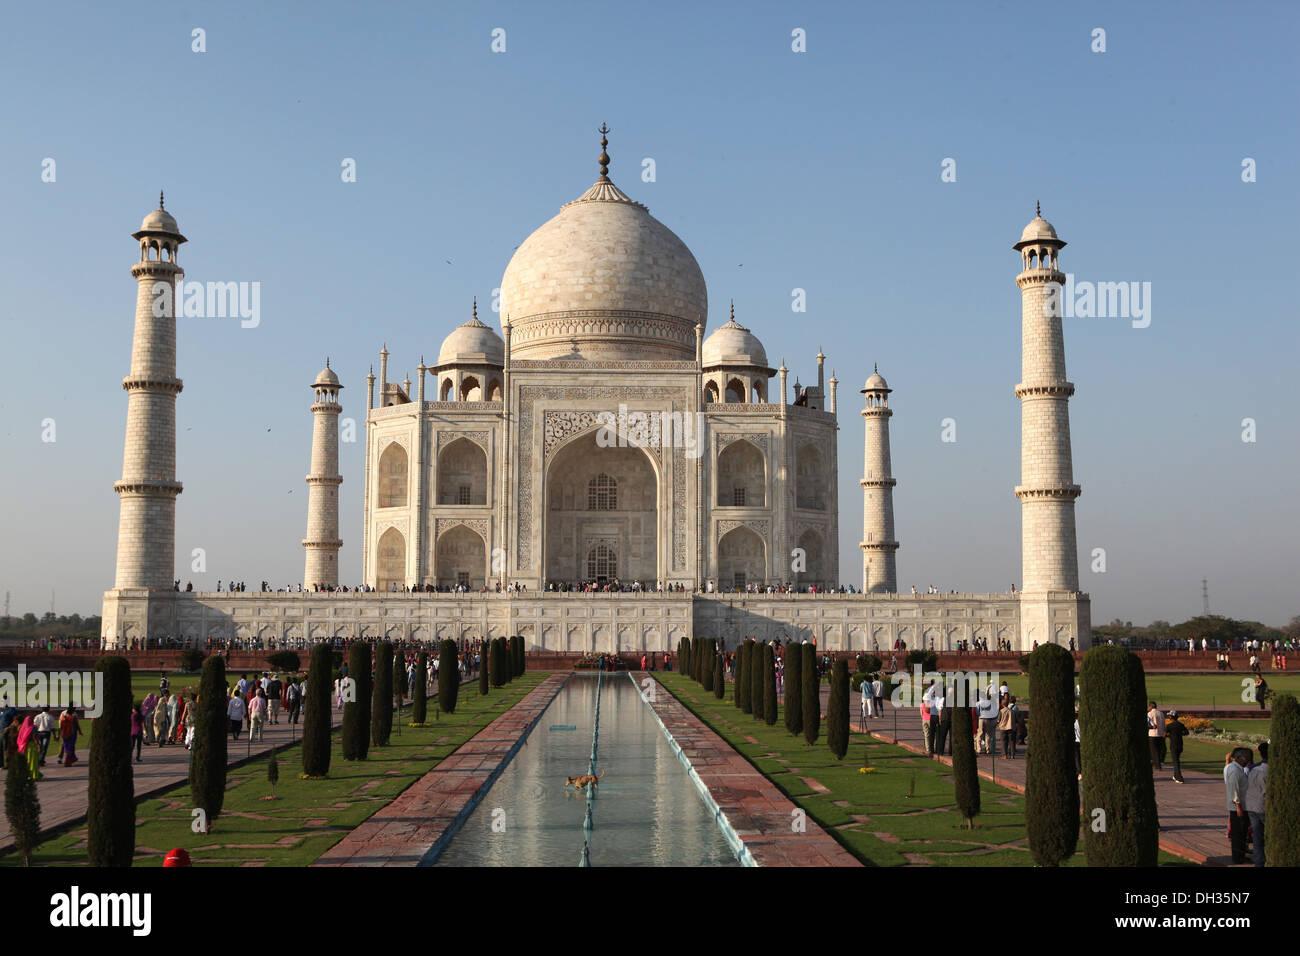 Taj Mahal, Agra, Uttar Pradesh, India, Asia Immagini Stock